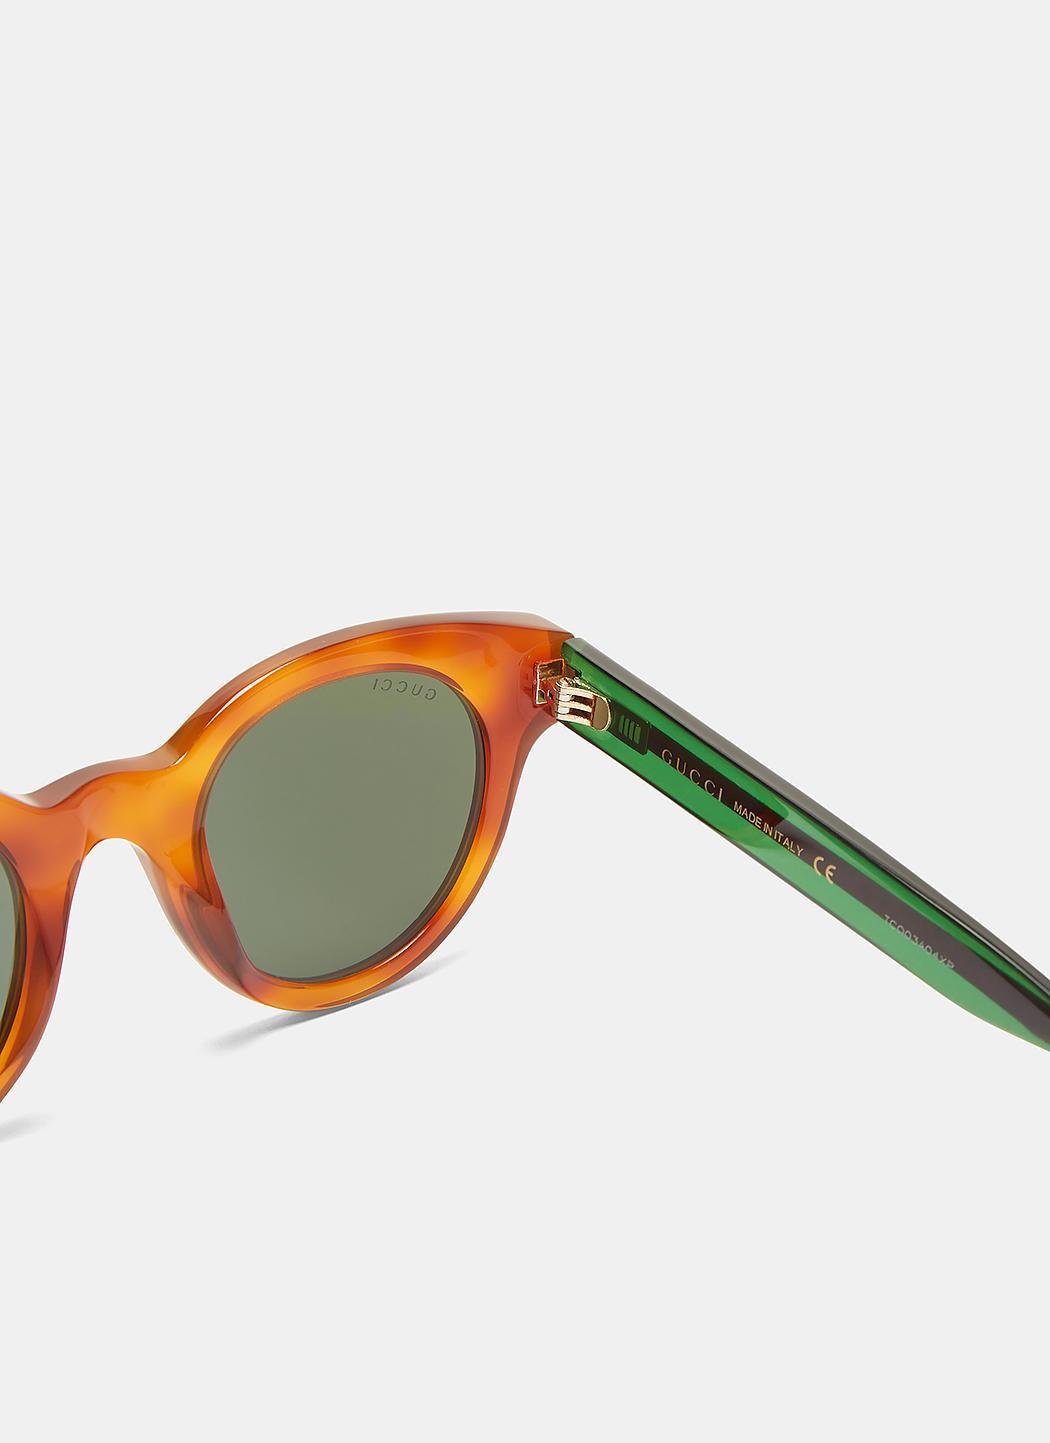 4411d763dc6 Lyst - Gucci Men s Tortoiseshell Striped Arm Round Sunglasses In ...